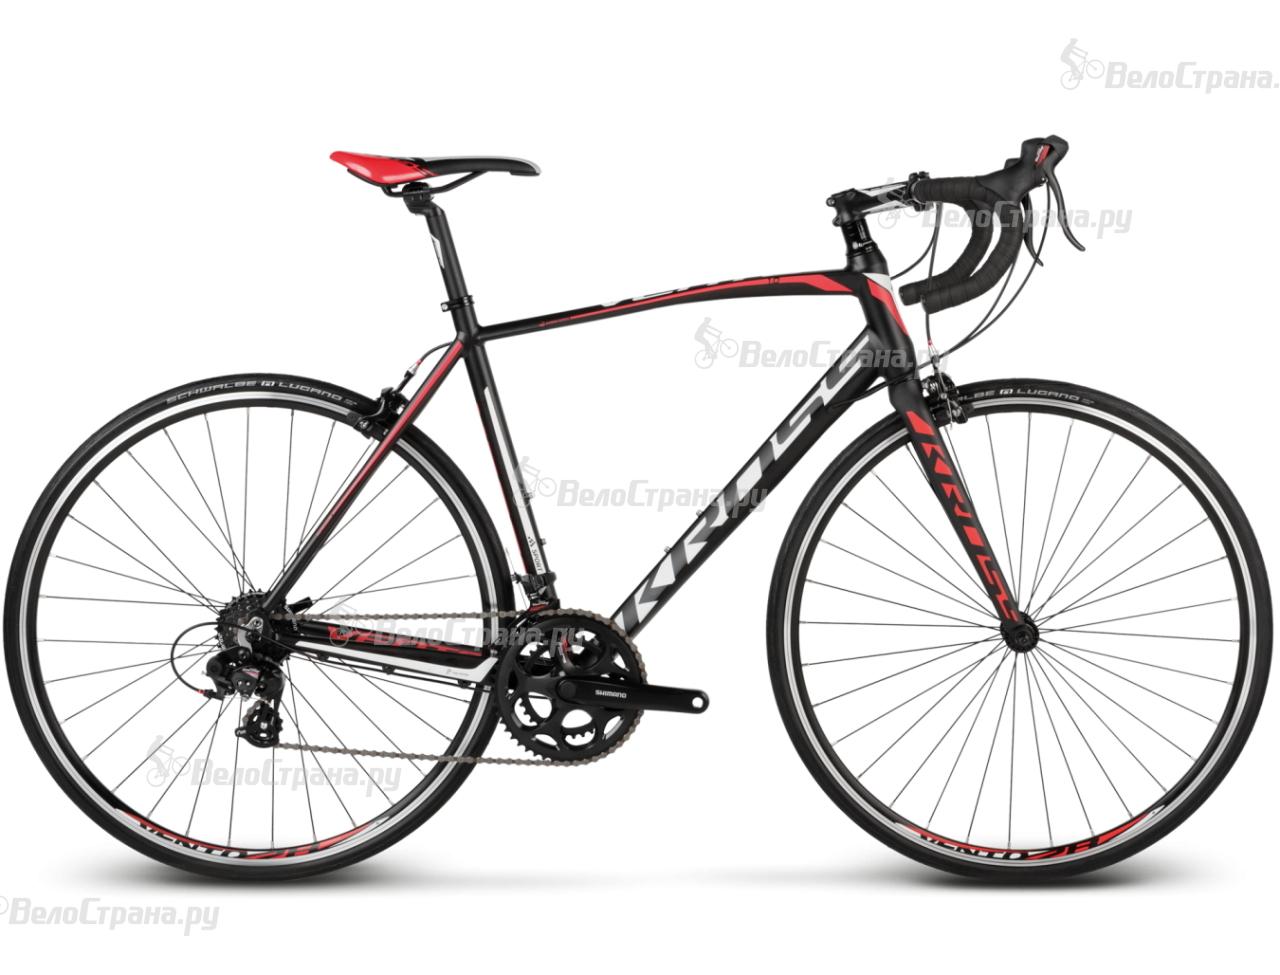 Велосипед Kross VENTO 1.0 (2017) велосипед kross lea f4 2017